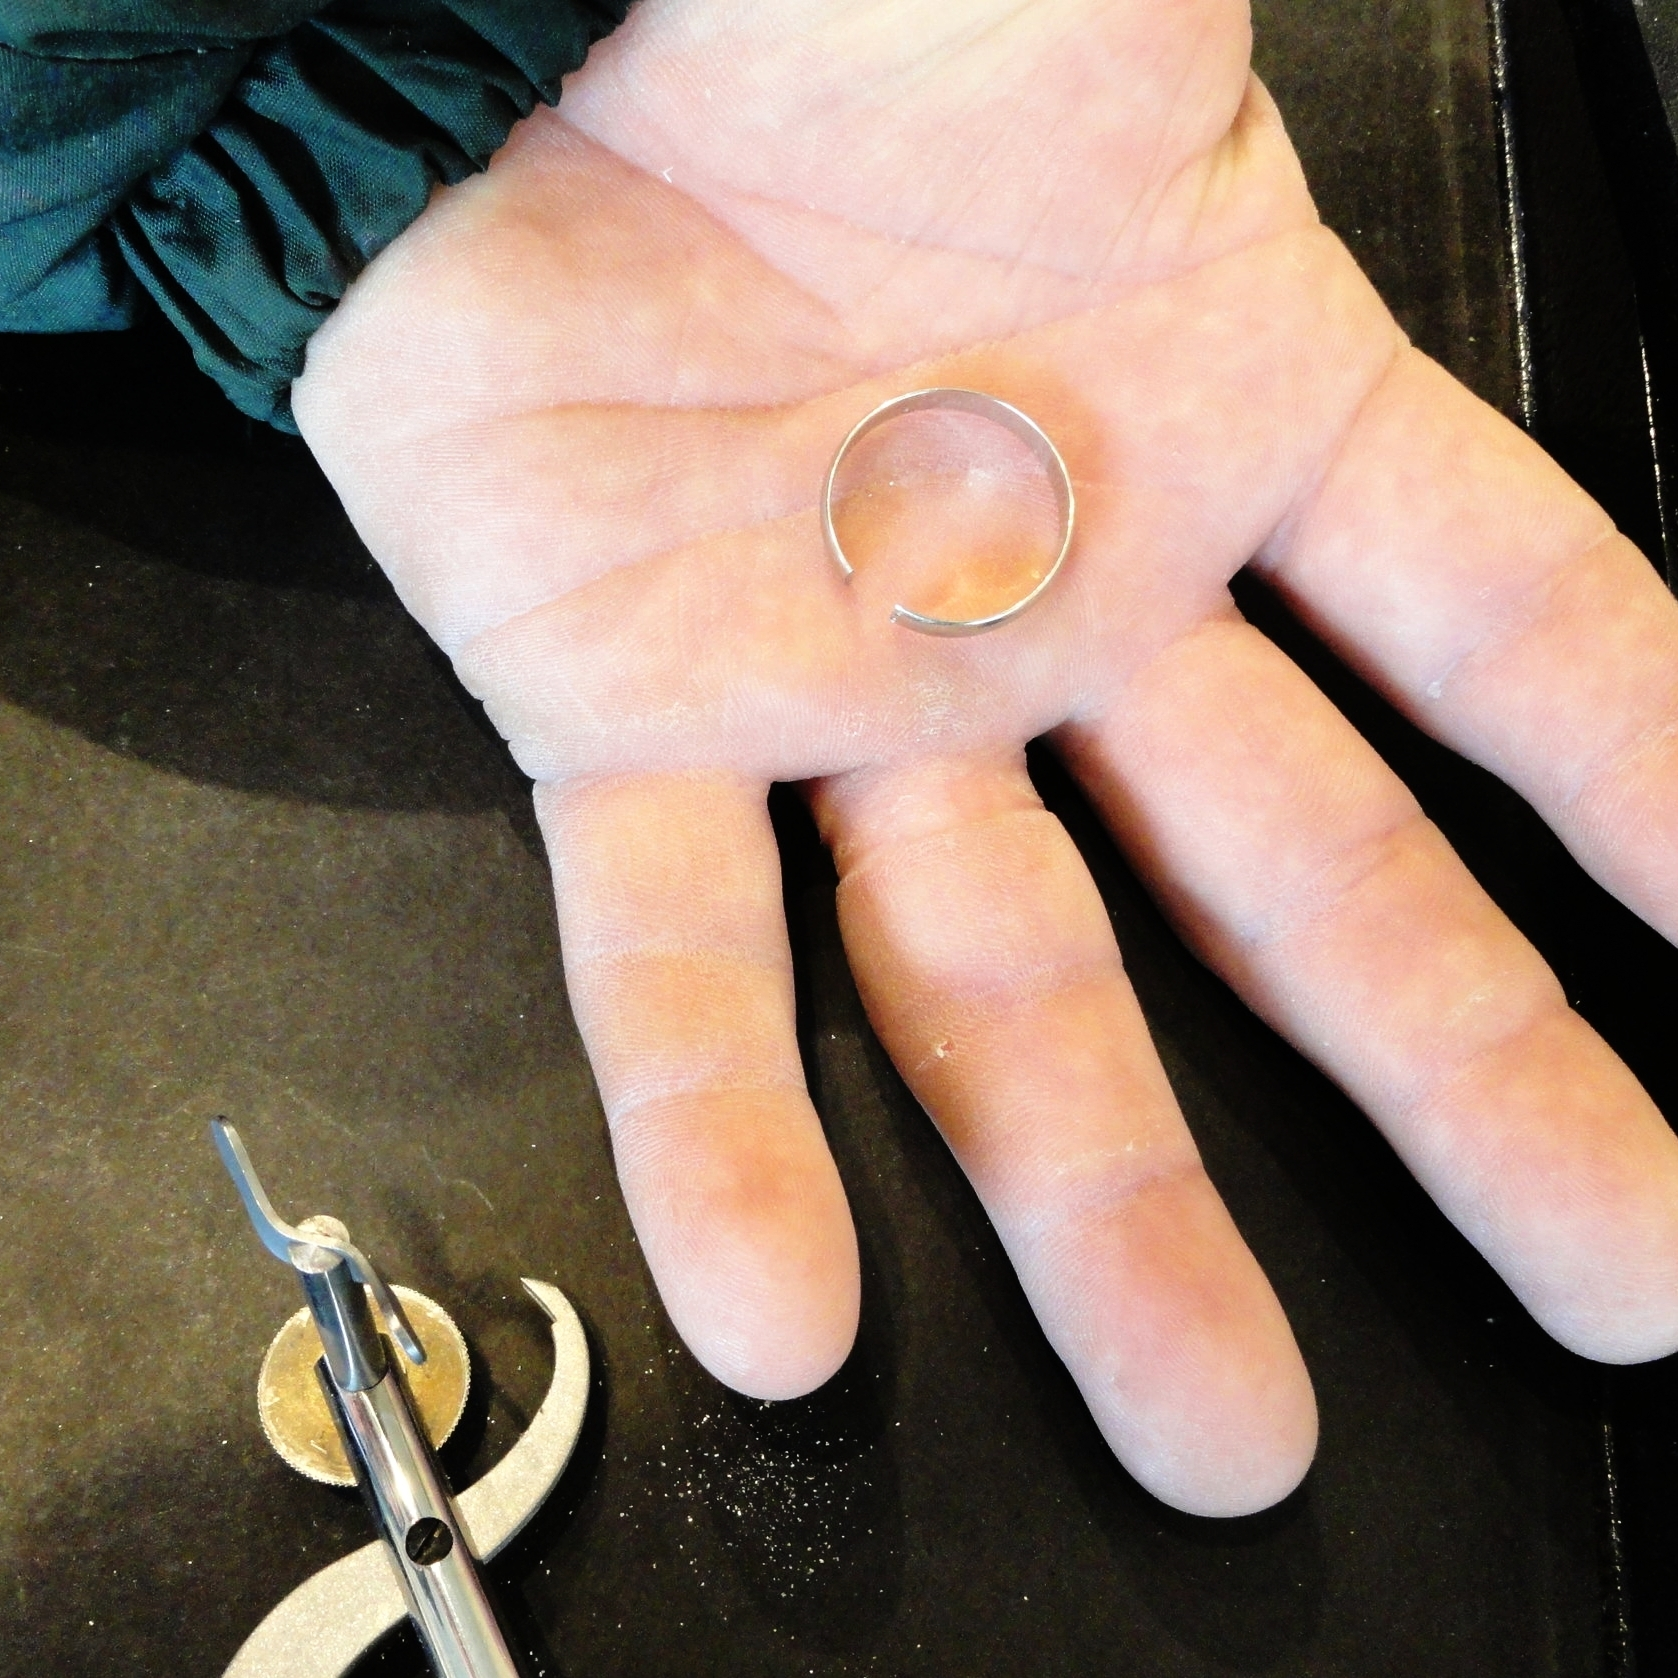 darvier-cut-my-ring-off.JPG